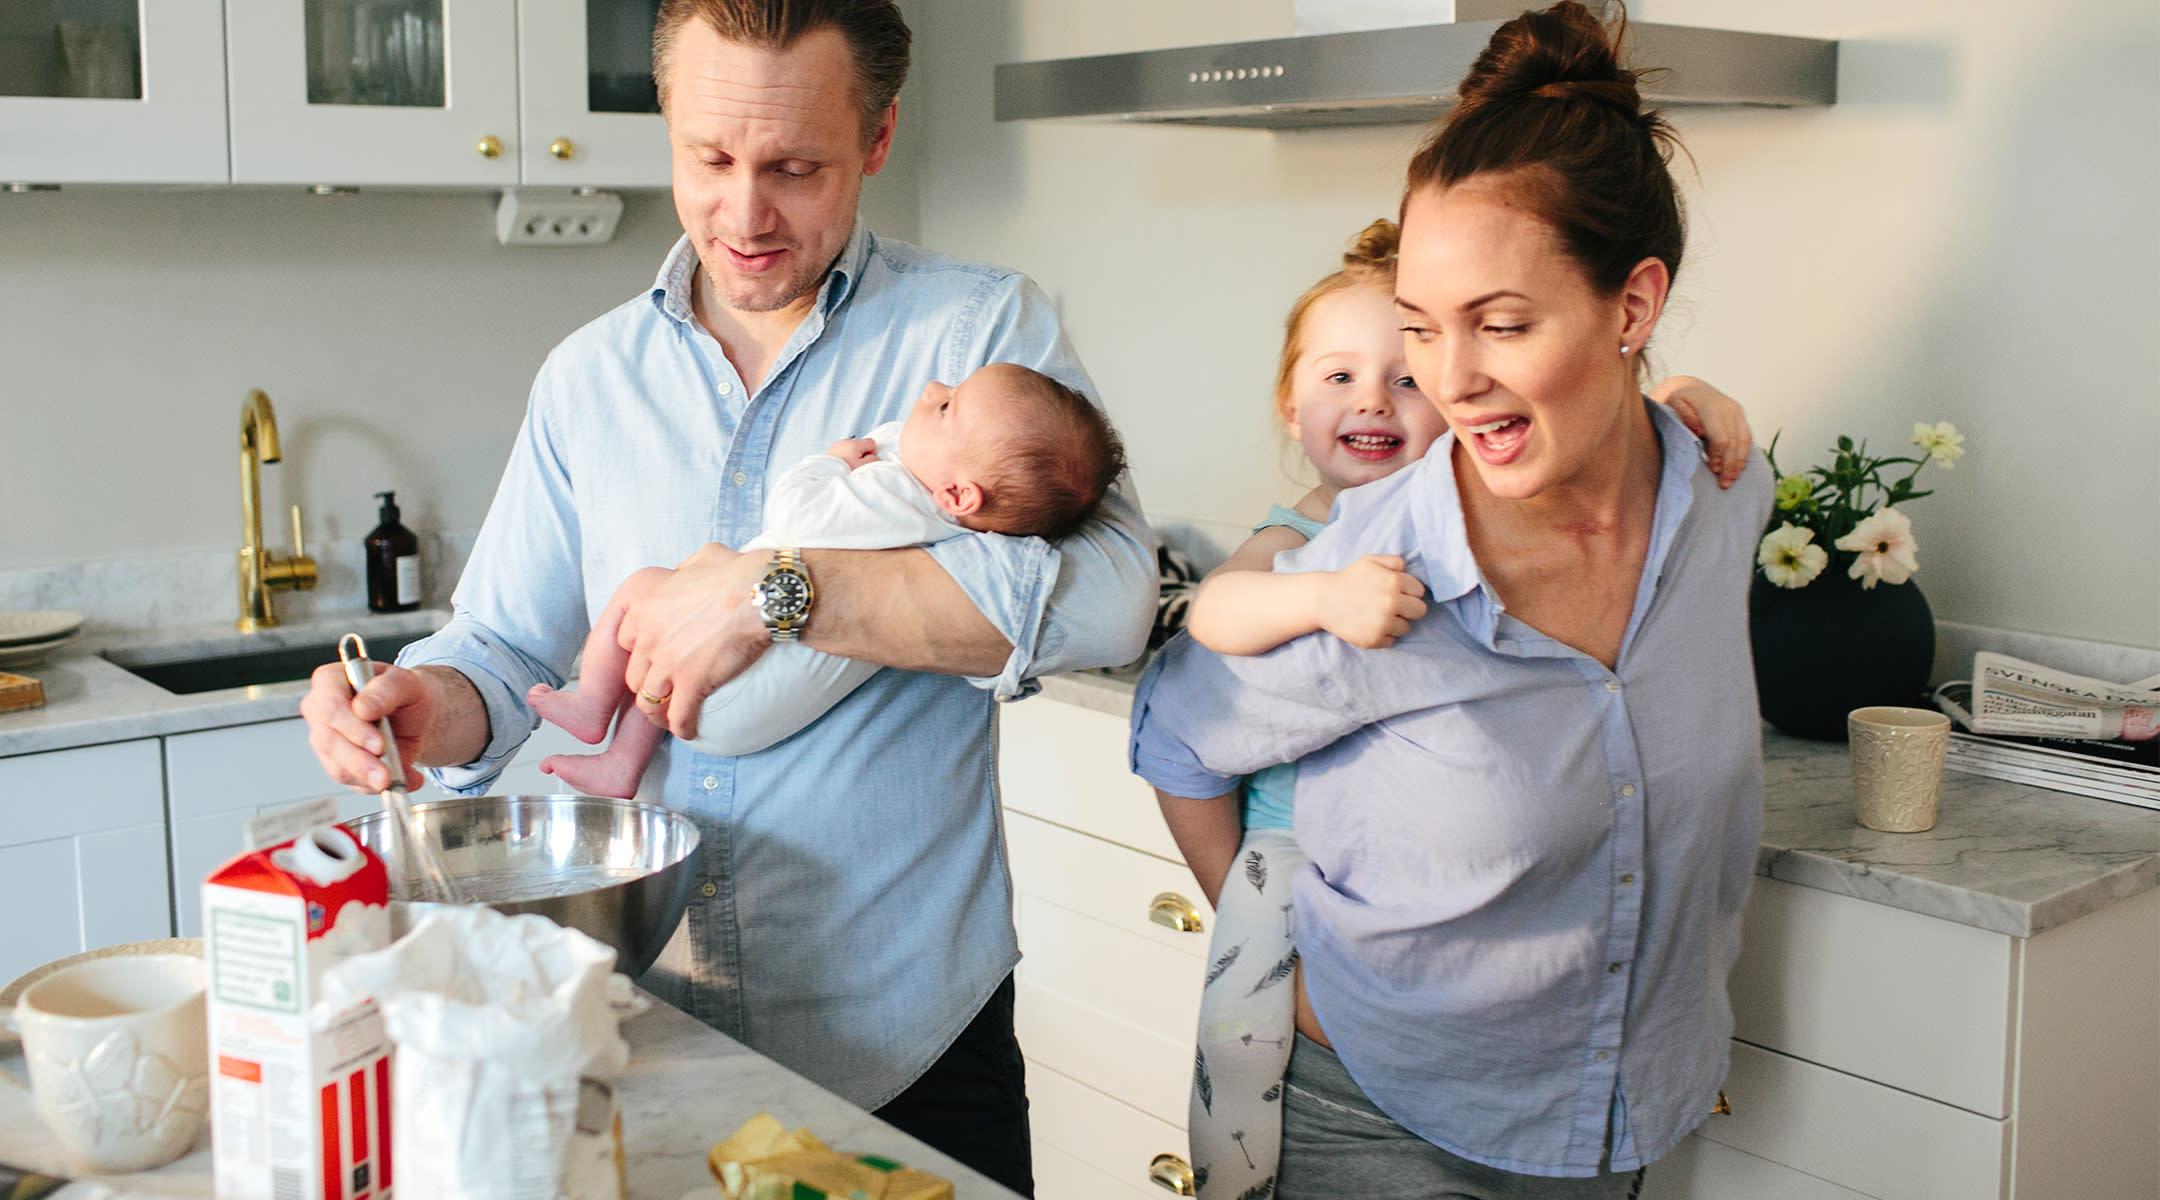 parents entertain hyper children in their kitchen while cooking